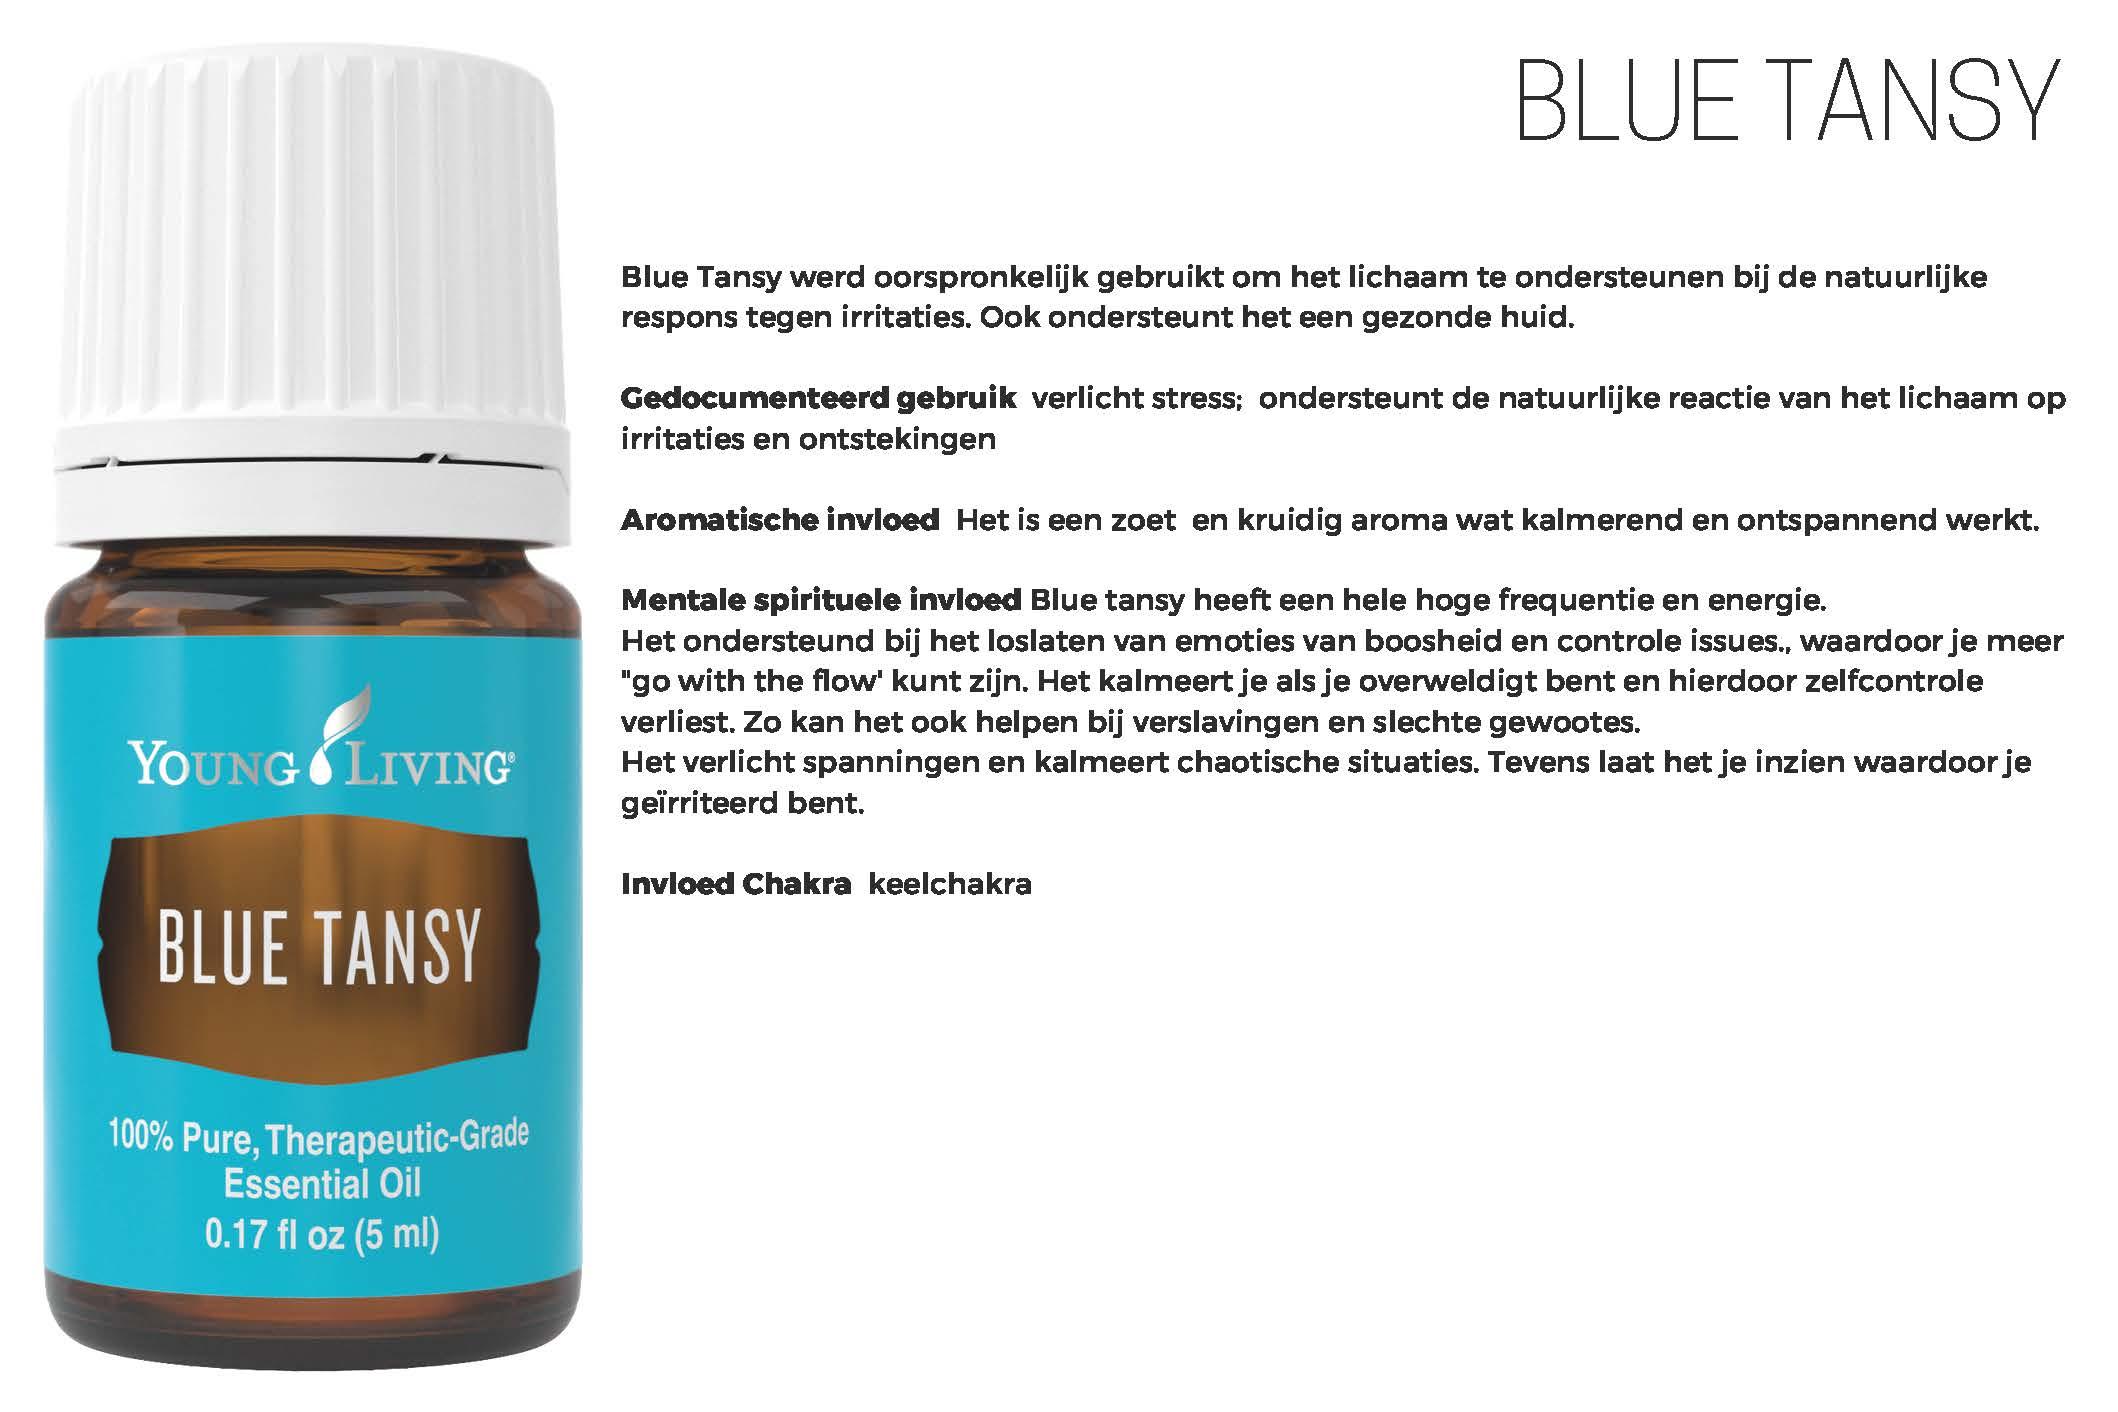 Blue Tansy